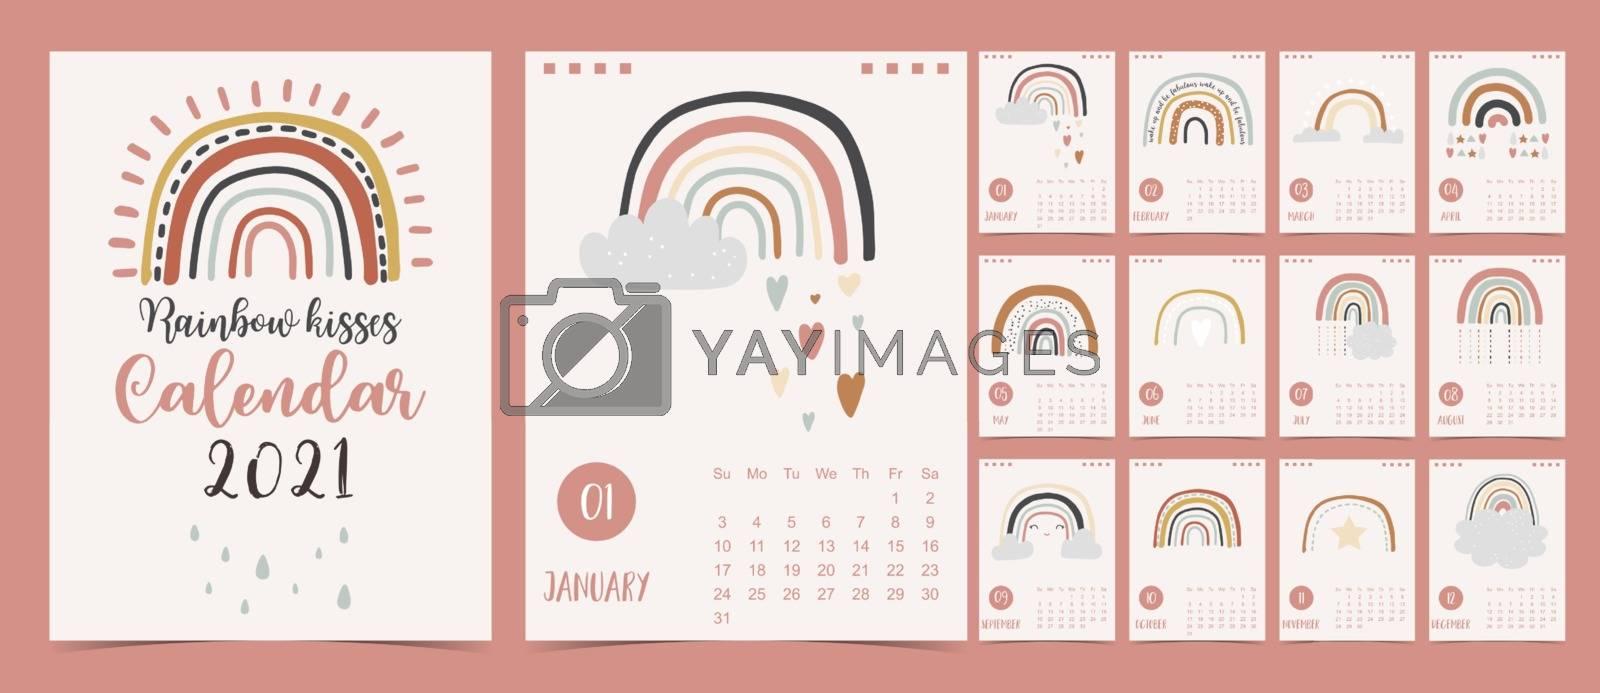 Cute pastel calendar 2021 with rainbow,rain,cloud for children, kid, baby